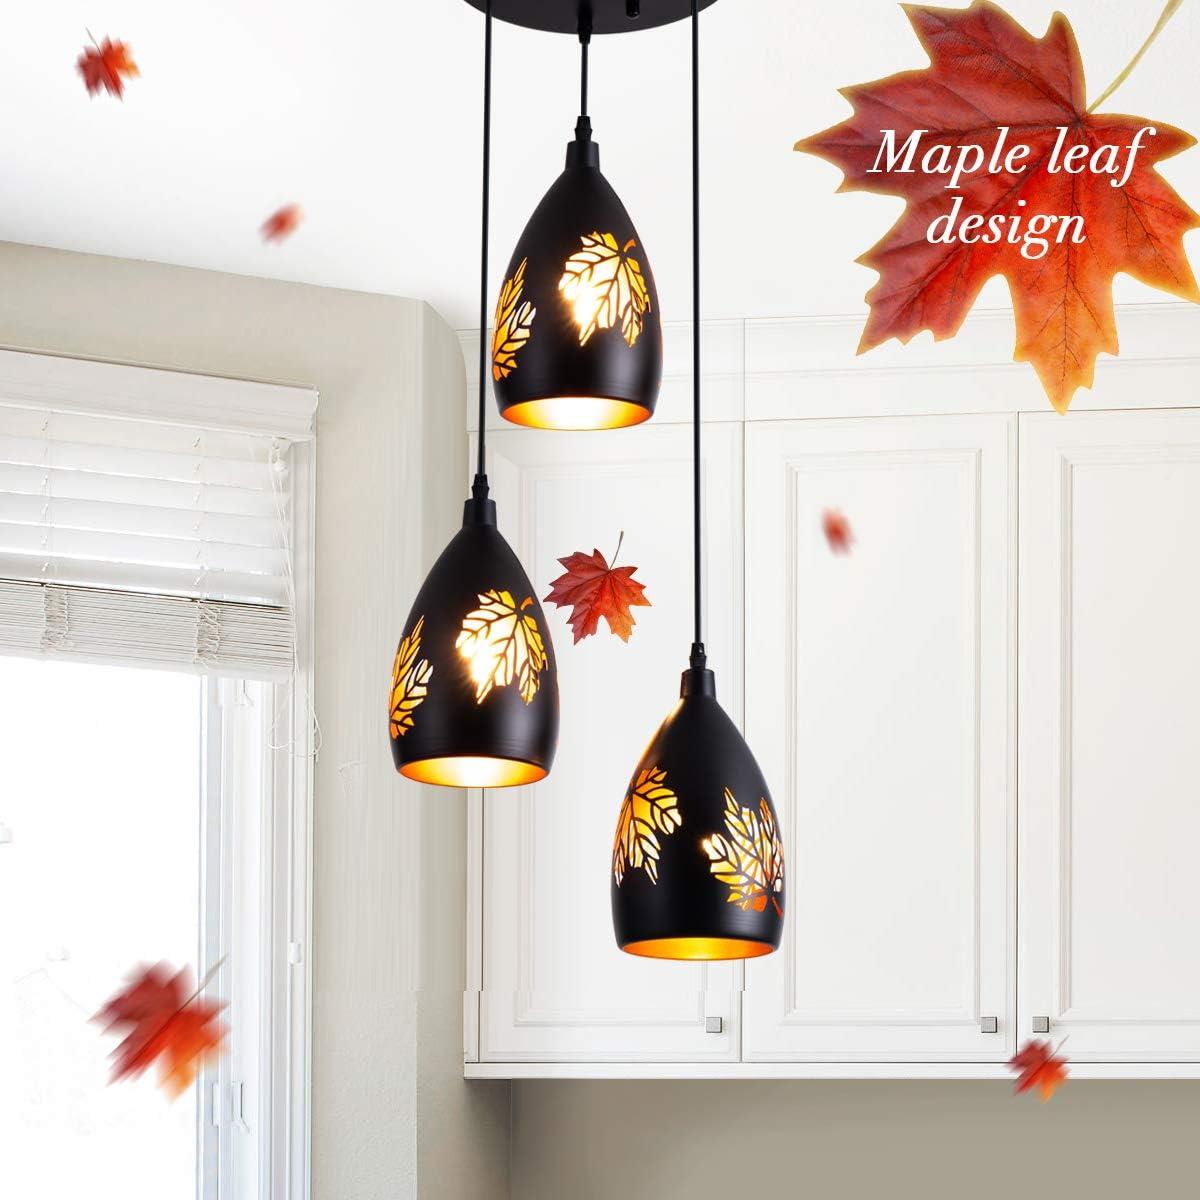 Weesalife 3 Light Pendant Vintage Adjustable Kitchen Lighting Fixture with Maple Leaves Pattern Carving Shade Black Hanging Industrial Pendant Lamp for Dining Room, Foyer, Loft, Hallway, Restaurant